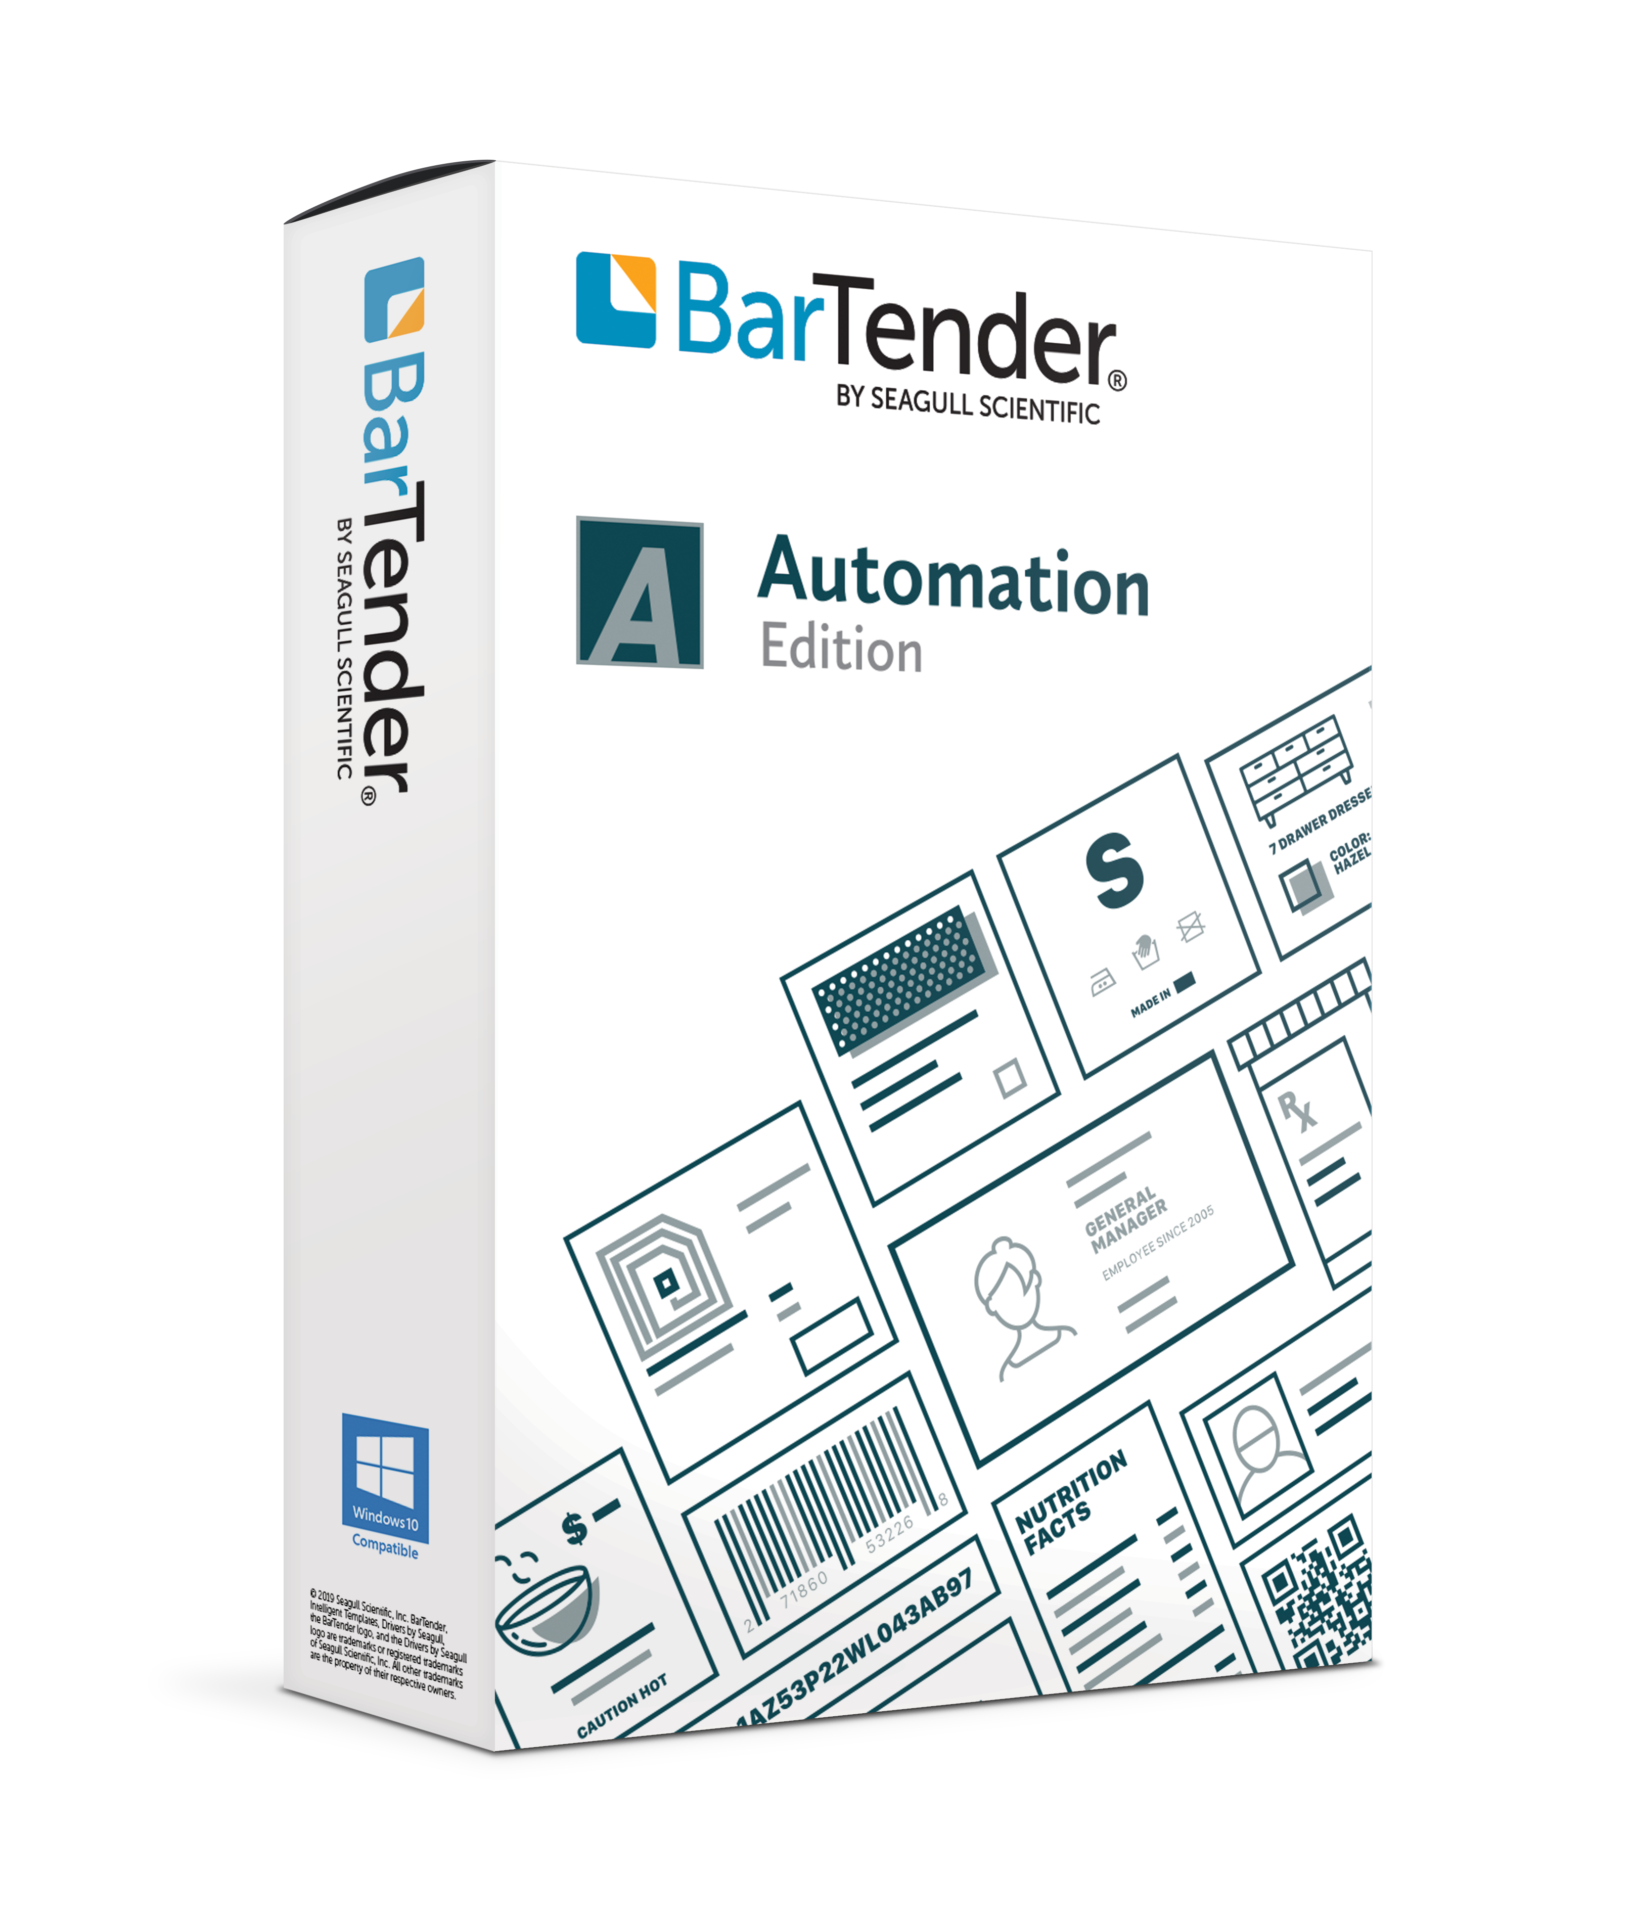 BarTender Box - Automation